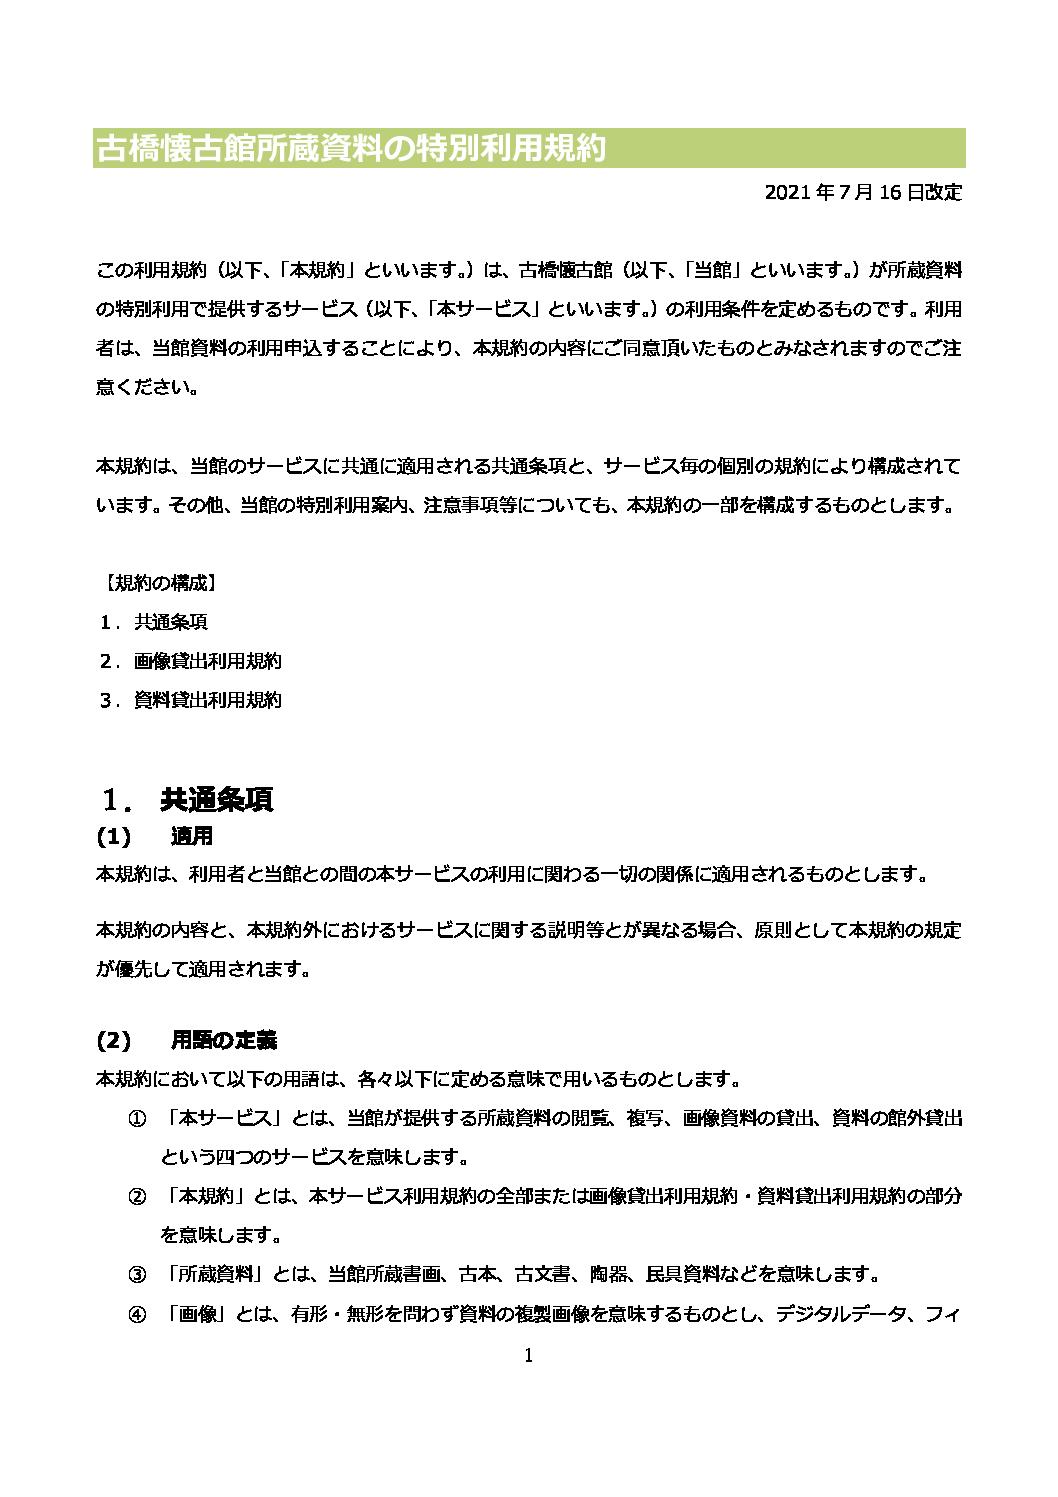 terms_of_service_furuhasikaikokan